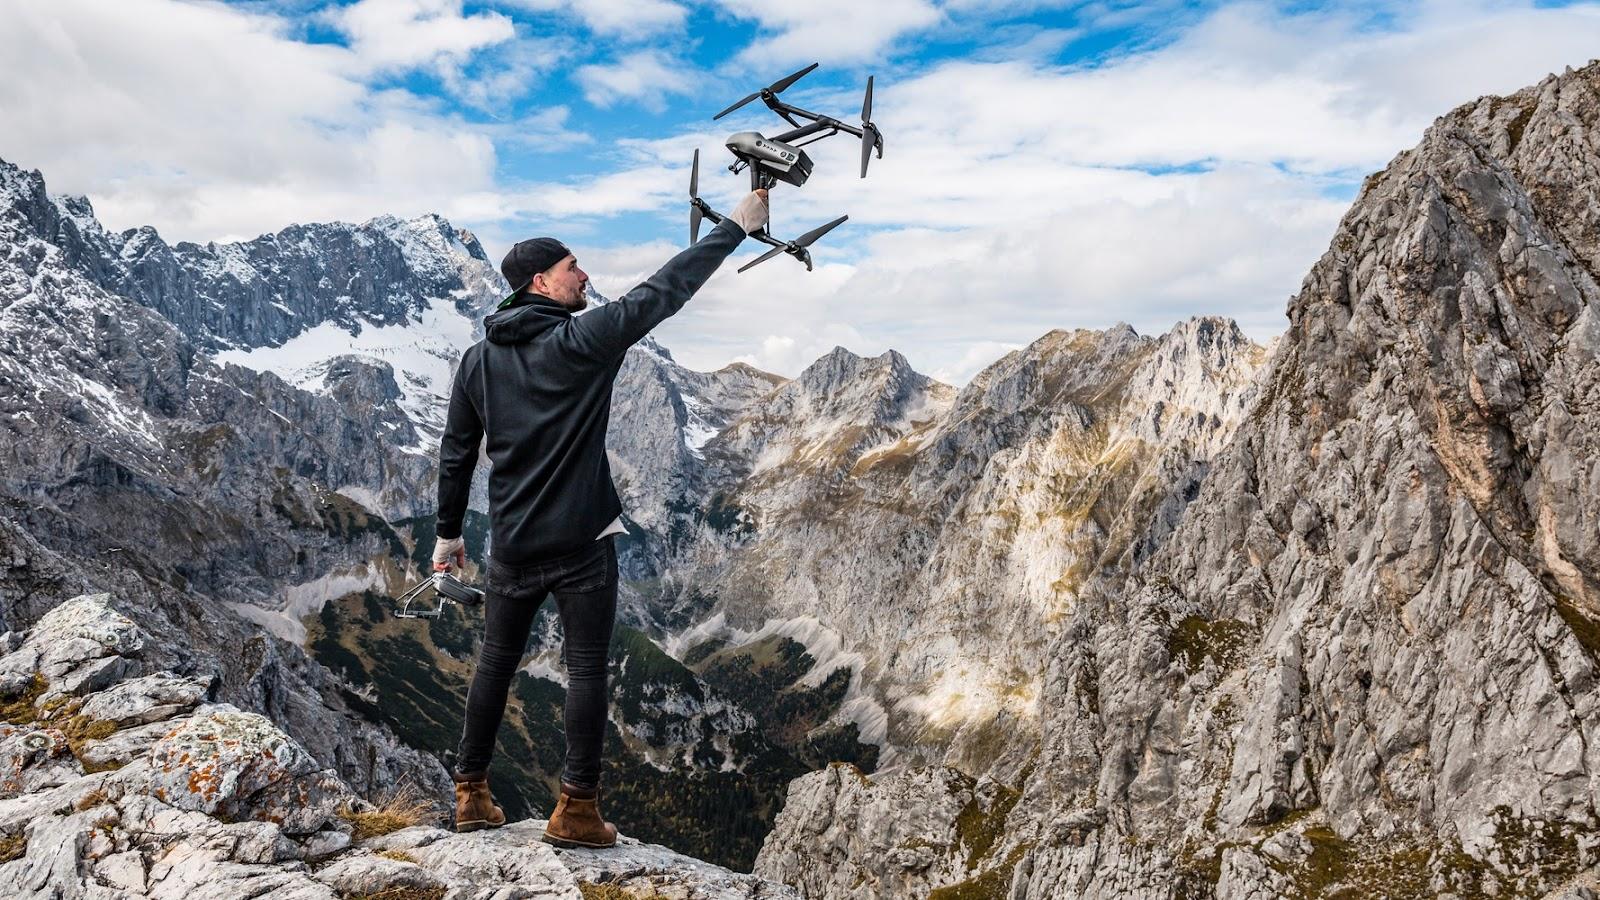 Top 10 Drones 2019